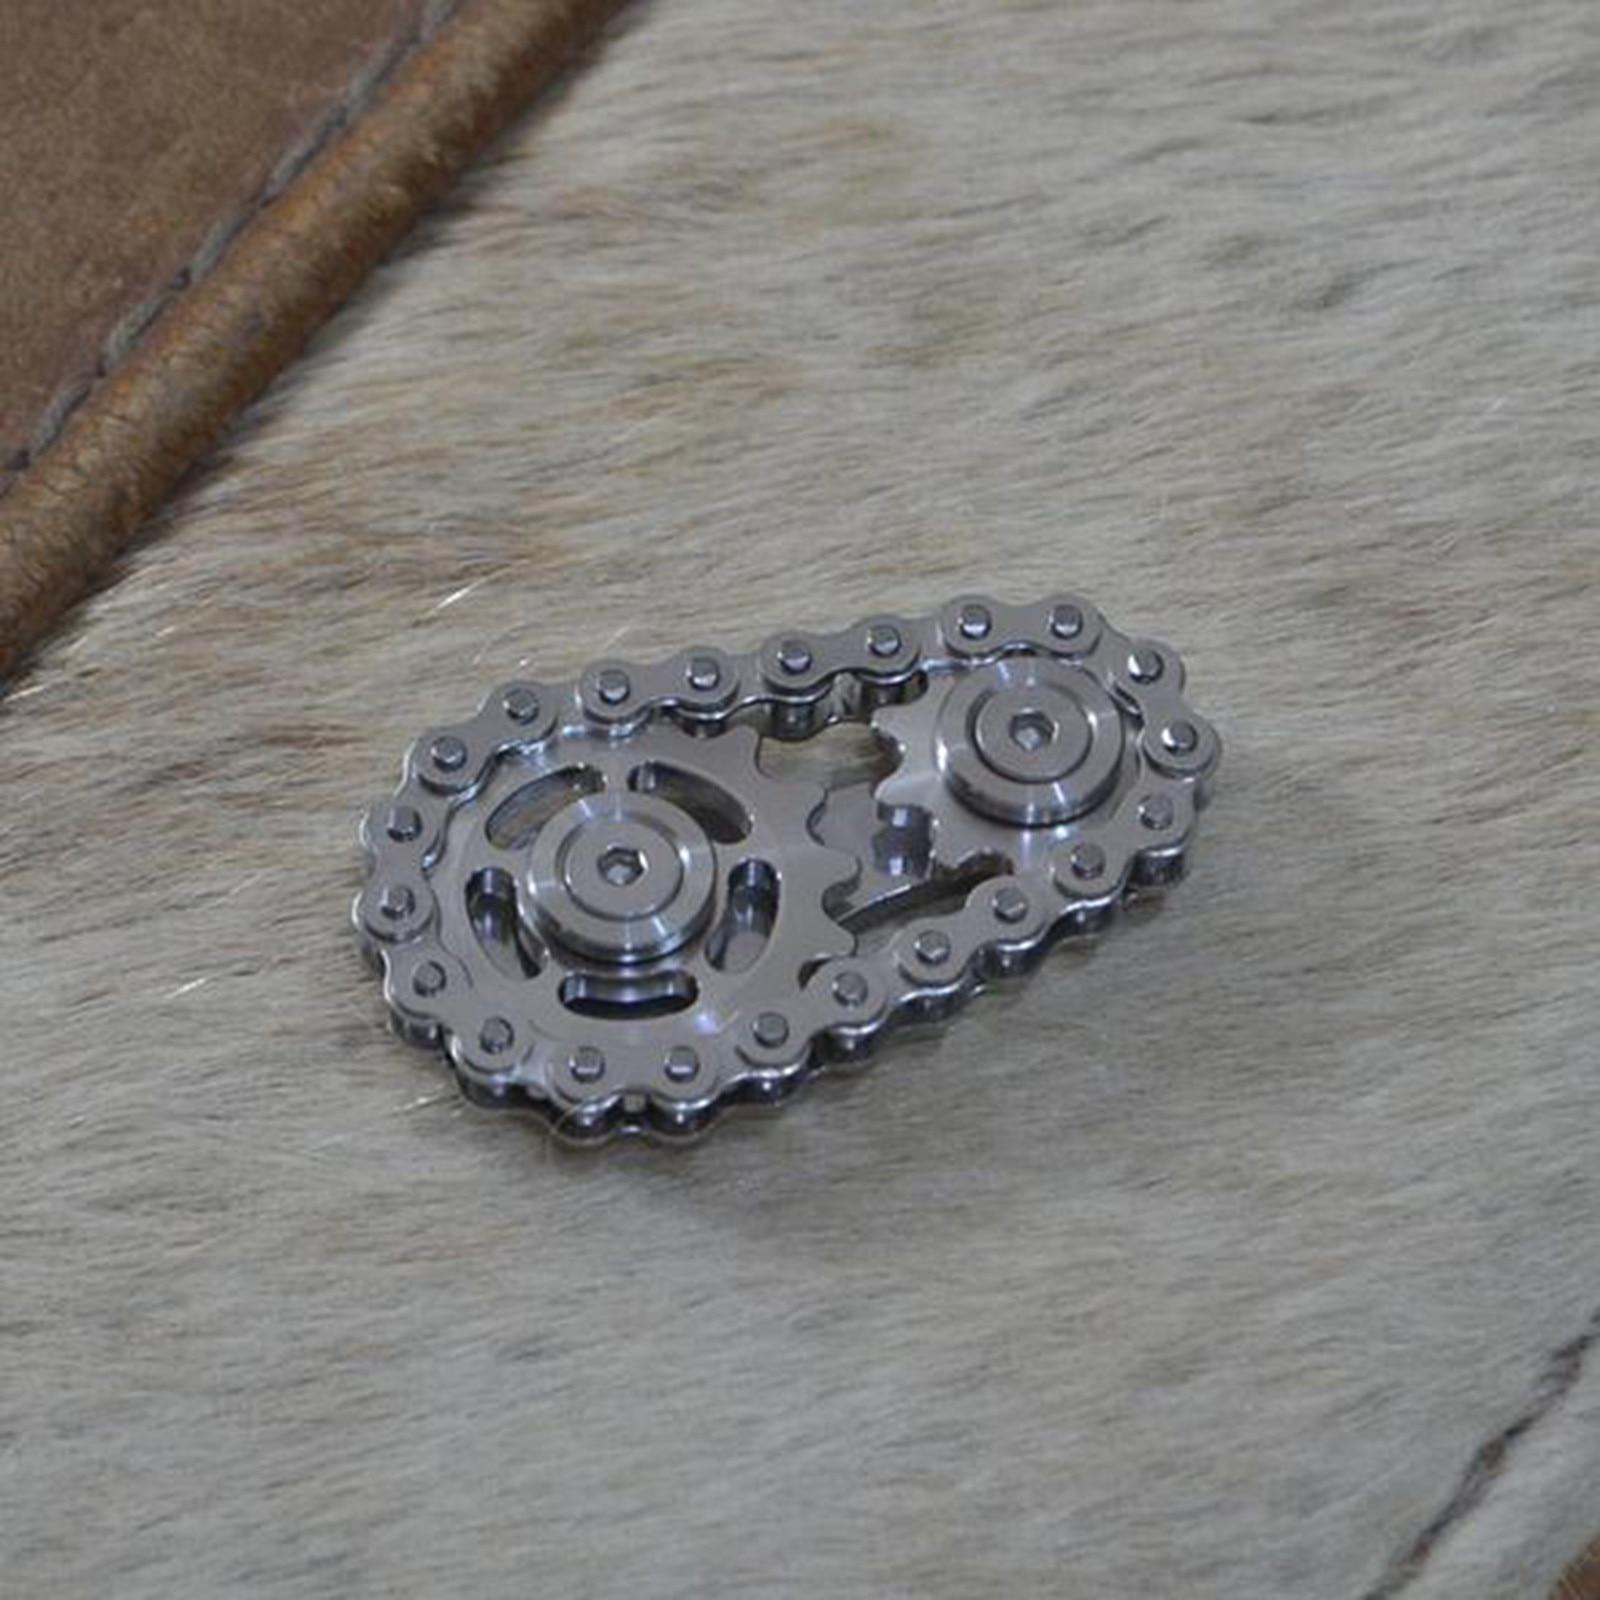 Children's toys, educational decompression toys, fingertip gyro sprocket sprocket flywheel toy NEW HOT полимерная глина 40* enlarge